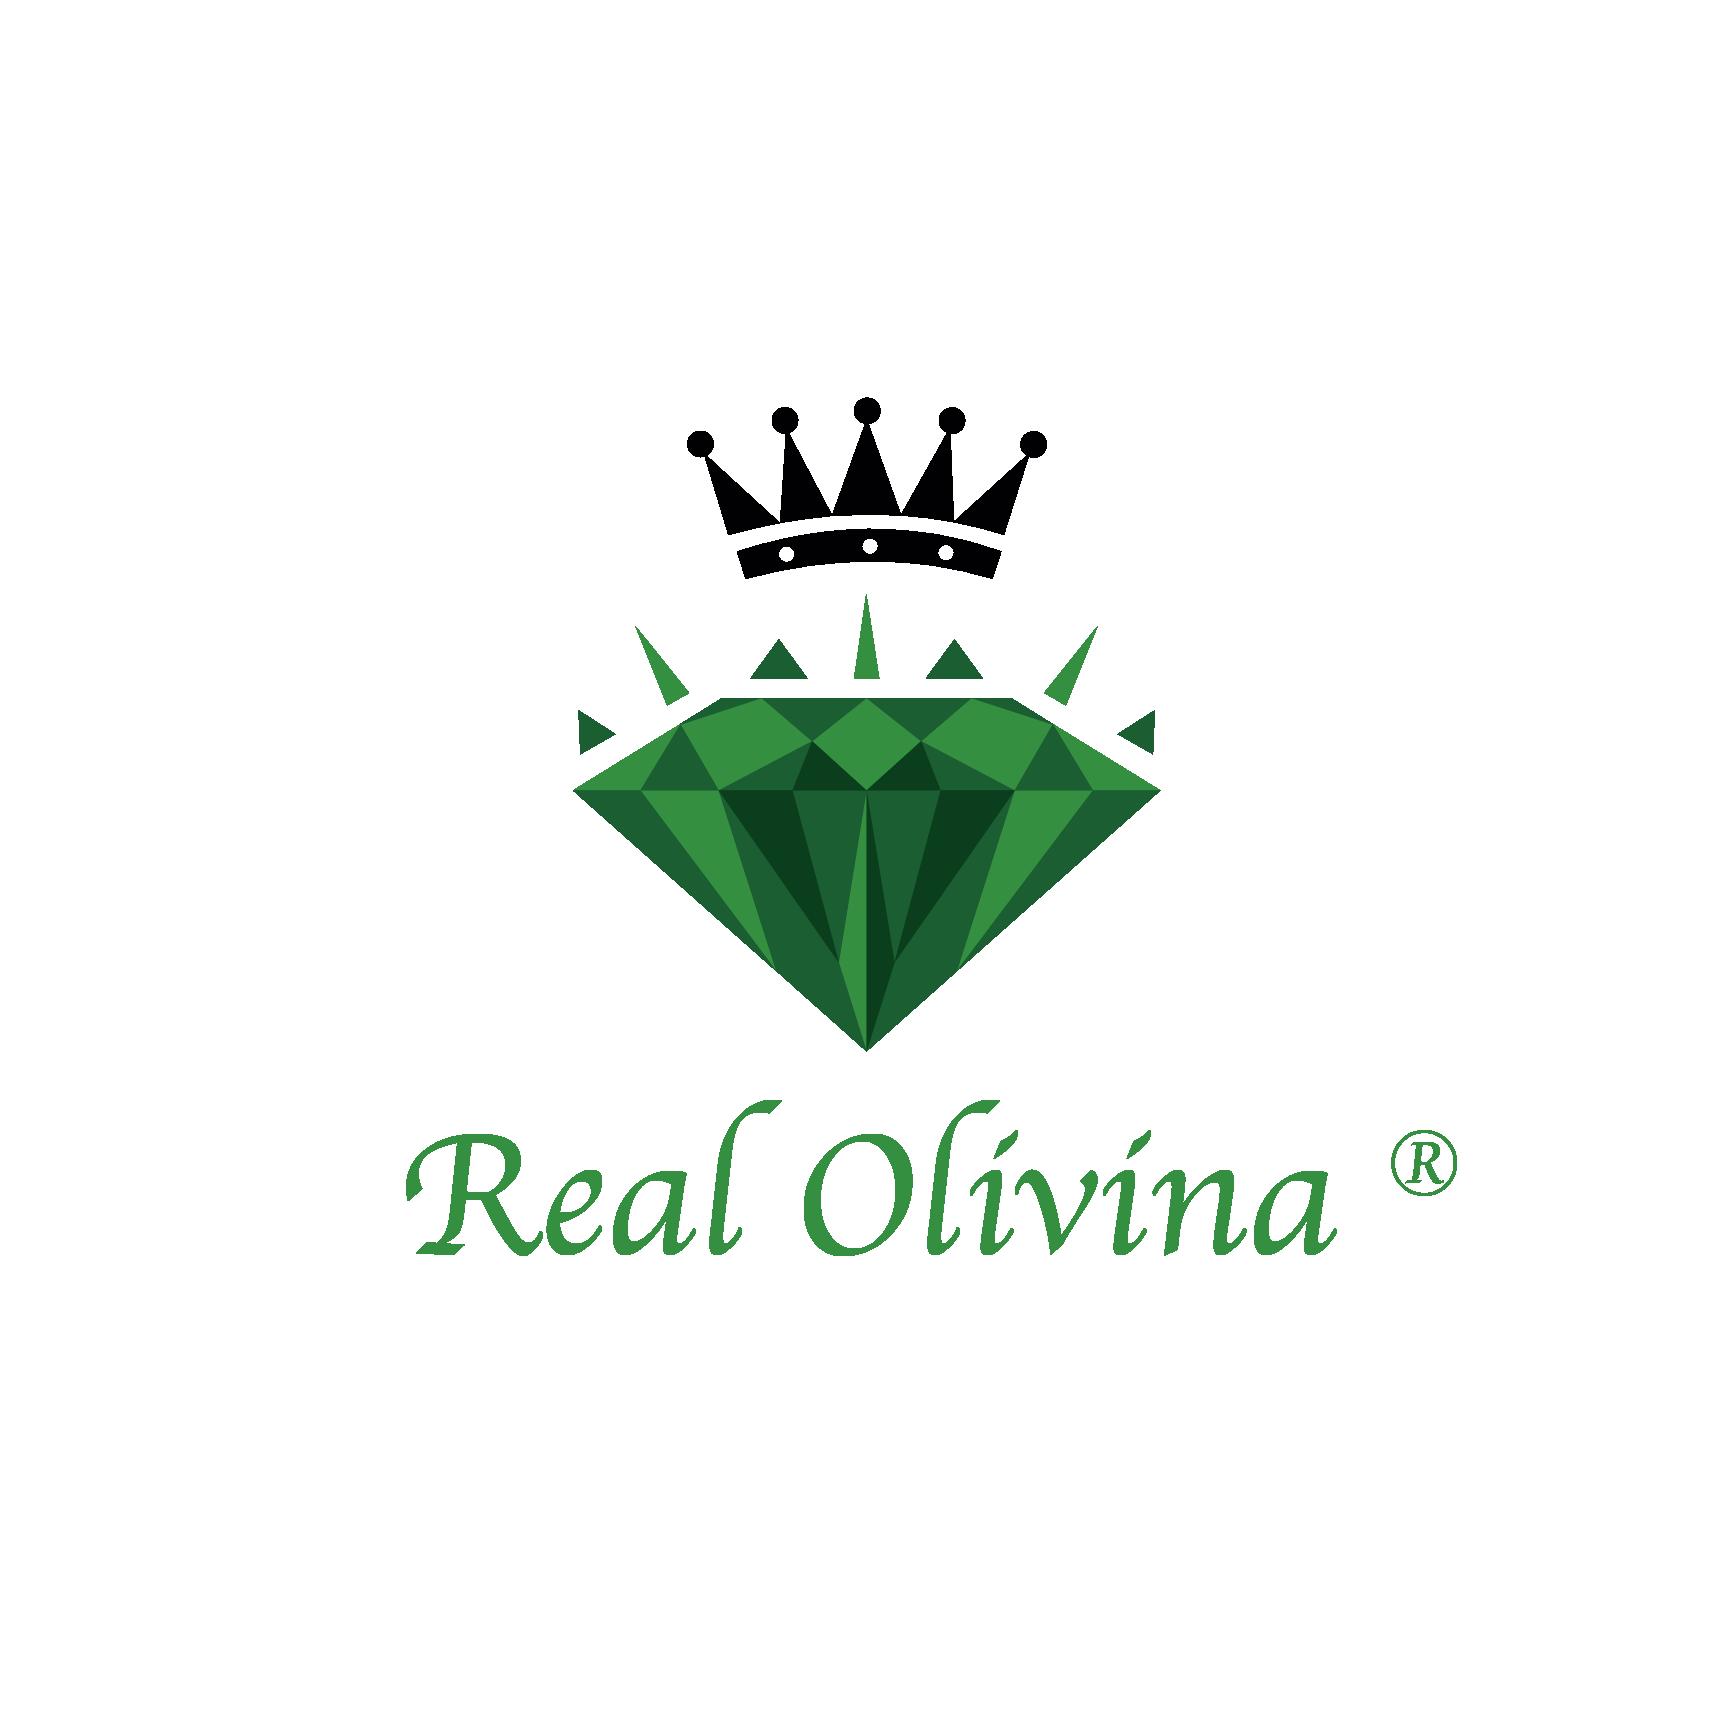 real olivina